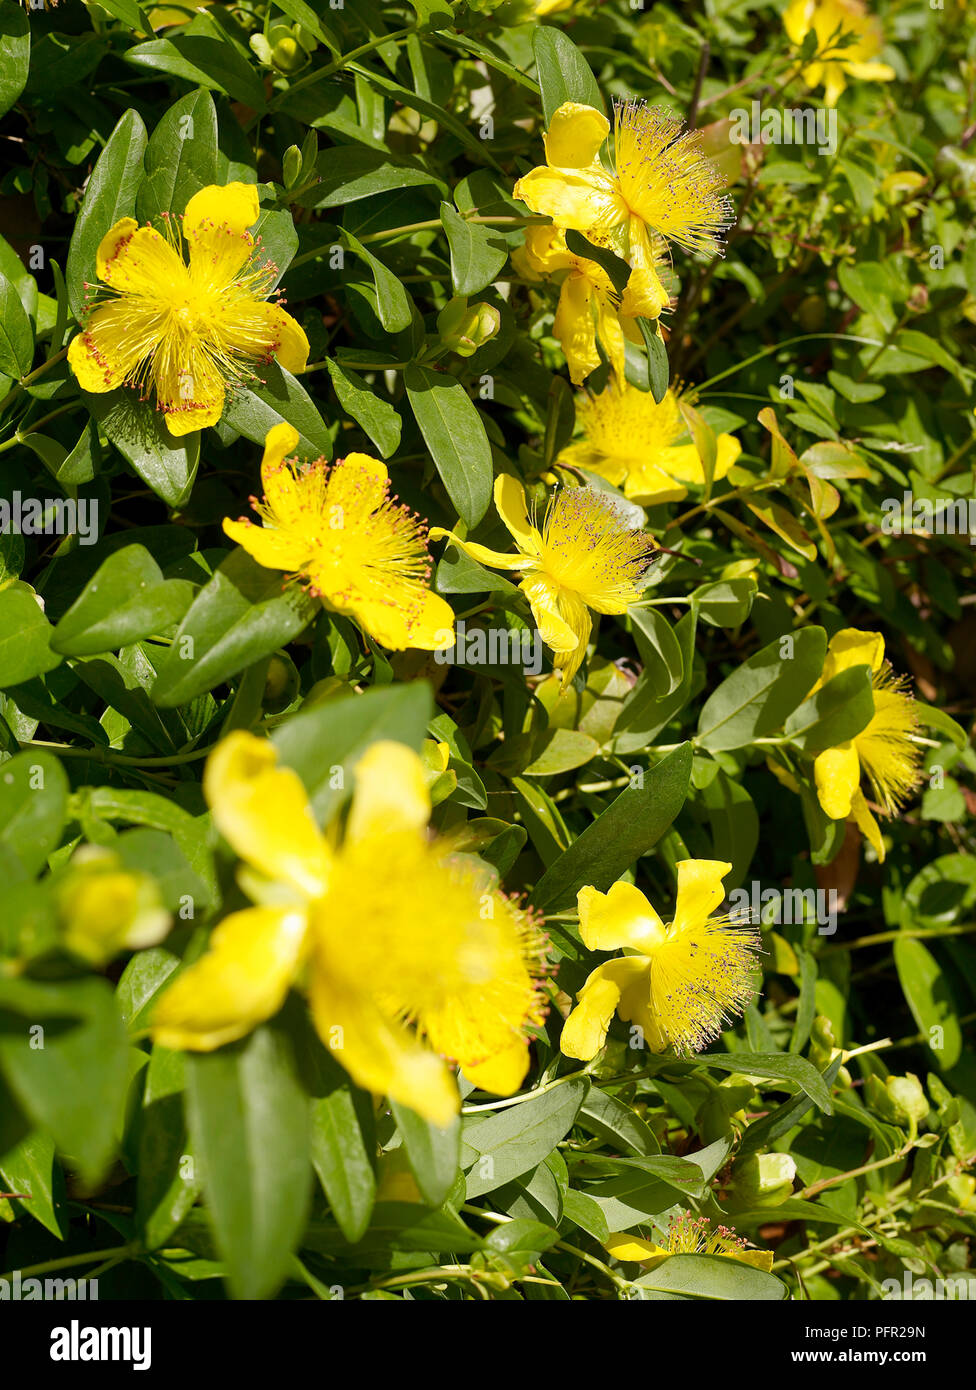 Hypericum Calycinum Rose Of Sharon Yellow Flowers Close Up Stock